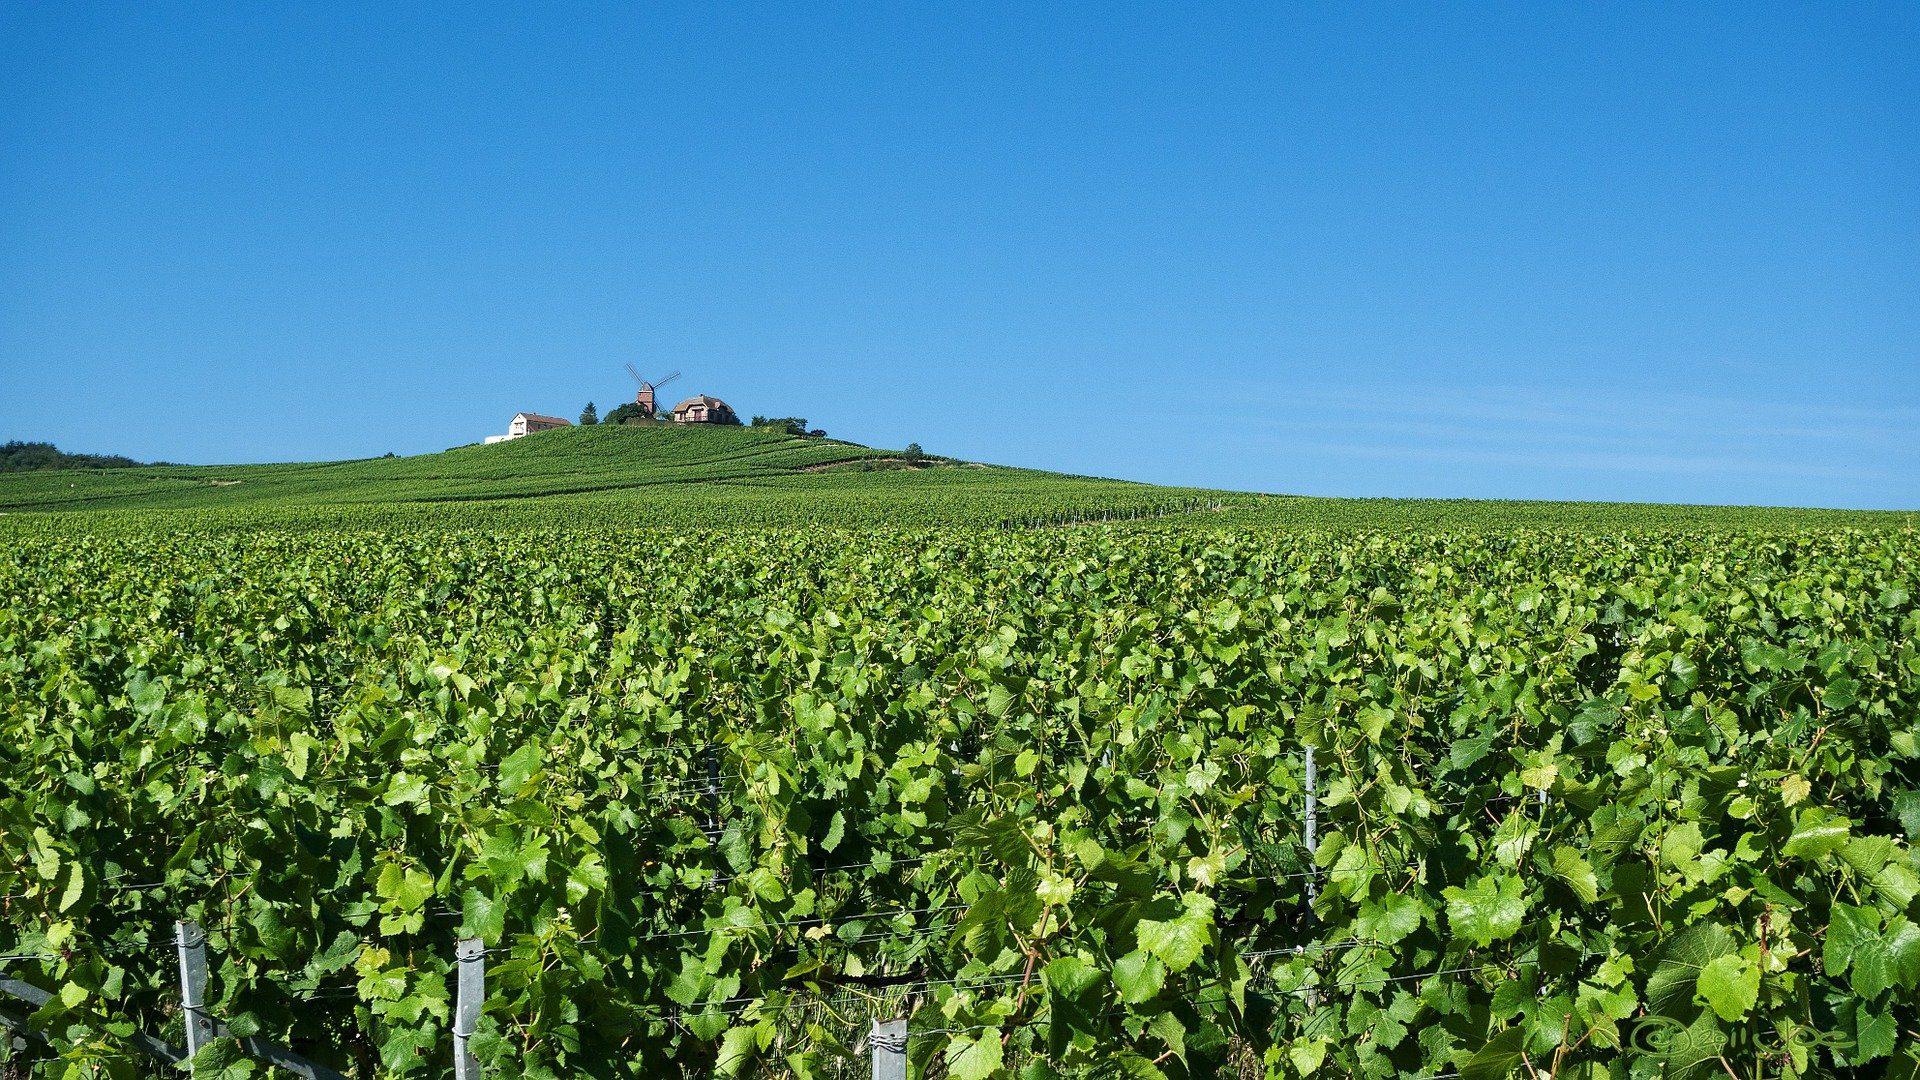 Vineyard in Champagne: Photo Pixabay